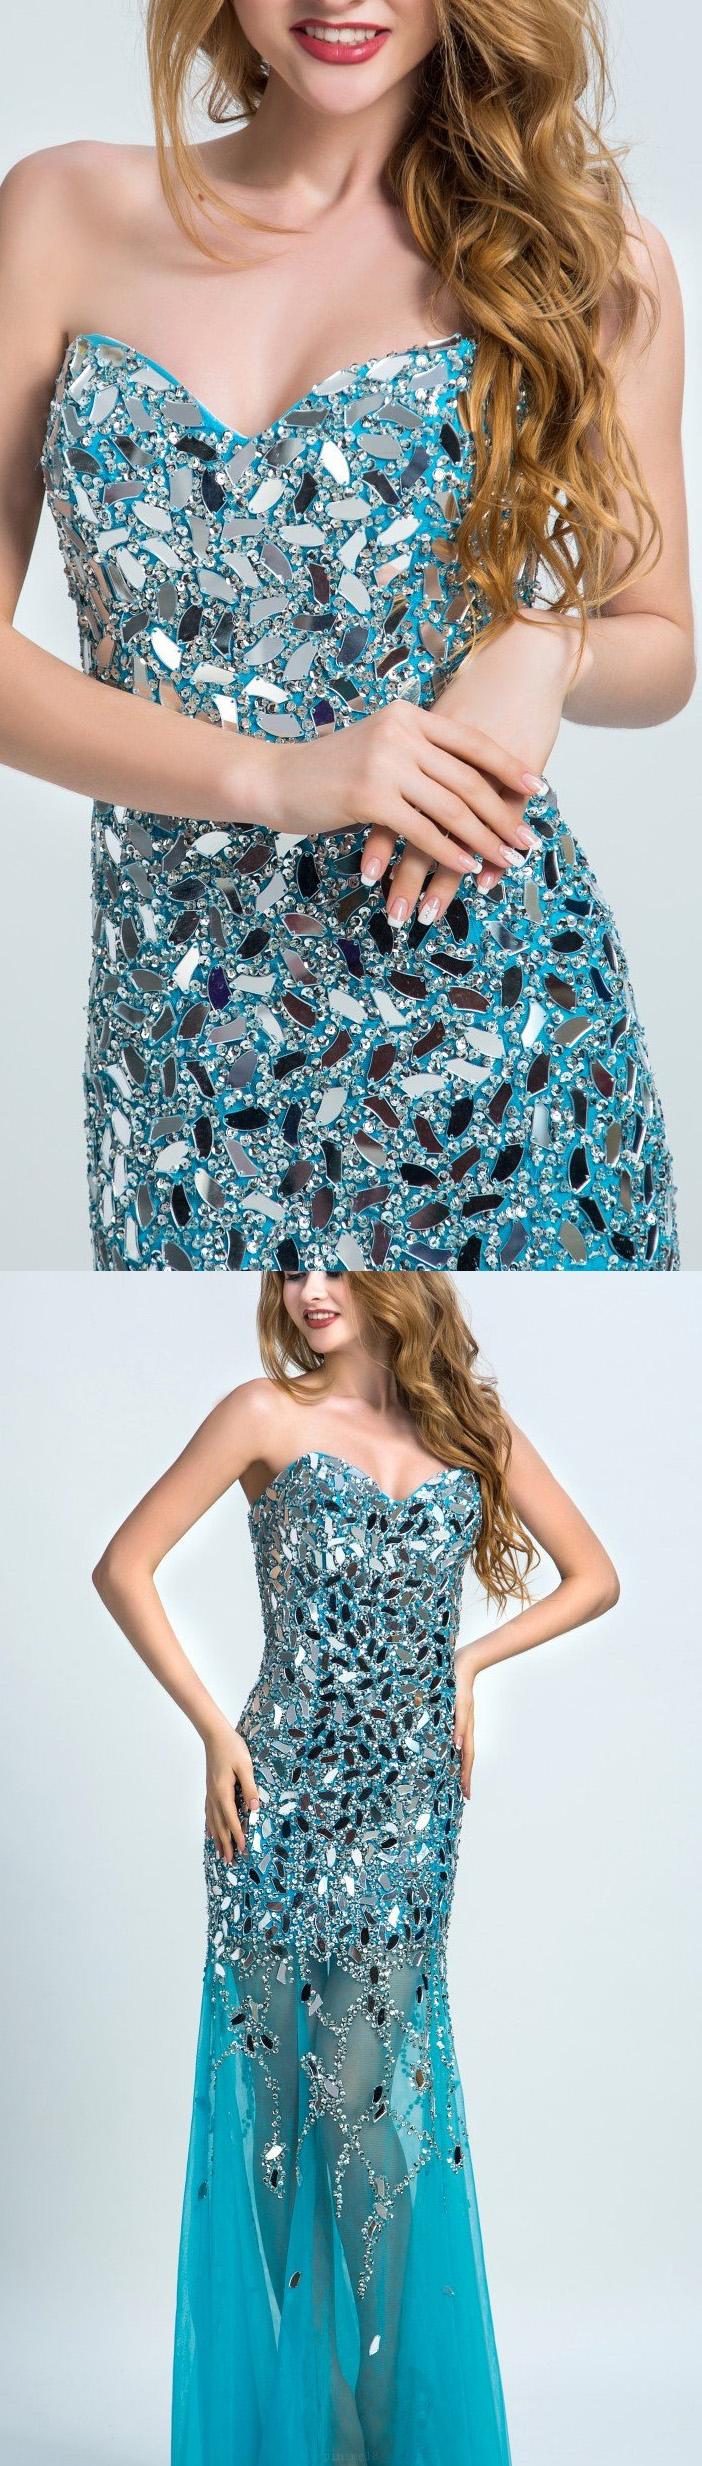 Outlet Light Blue Sheath/Column Prom Evening Dresses Dazzling Long ...